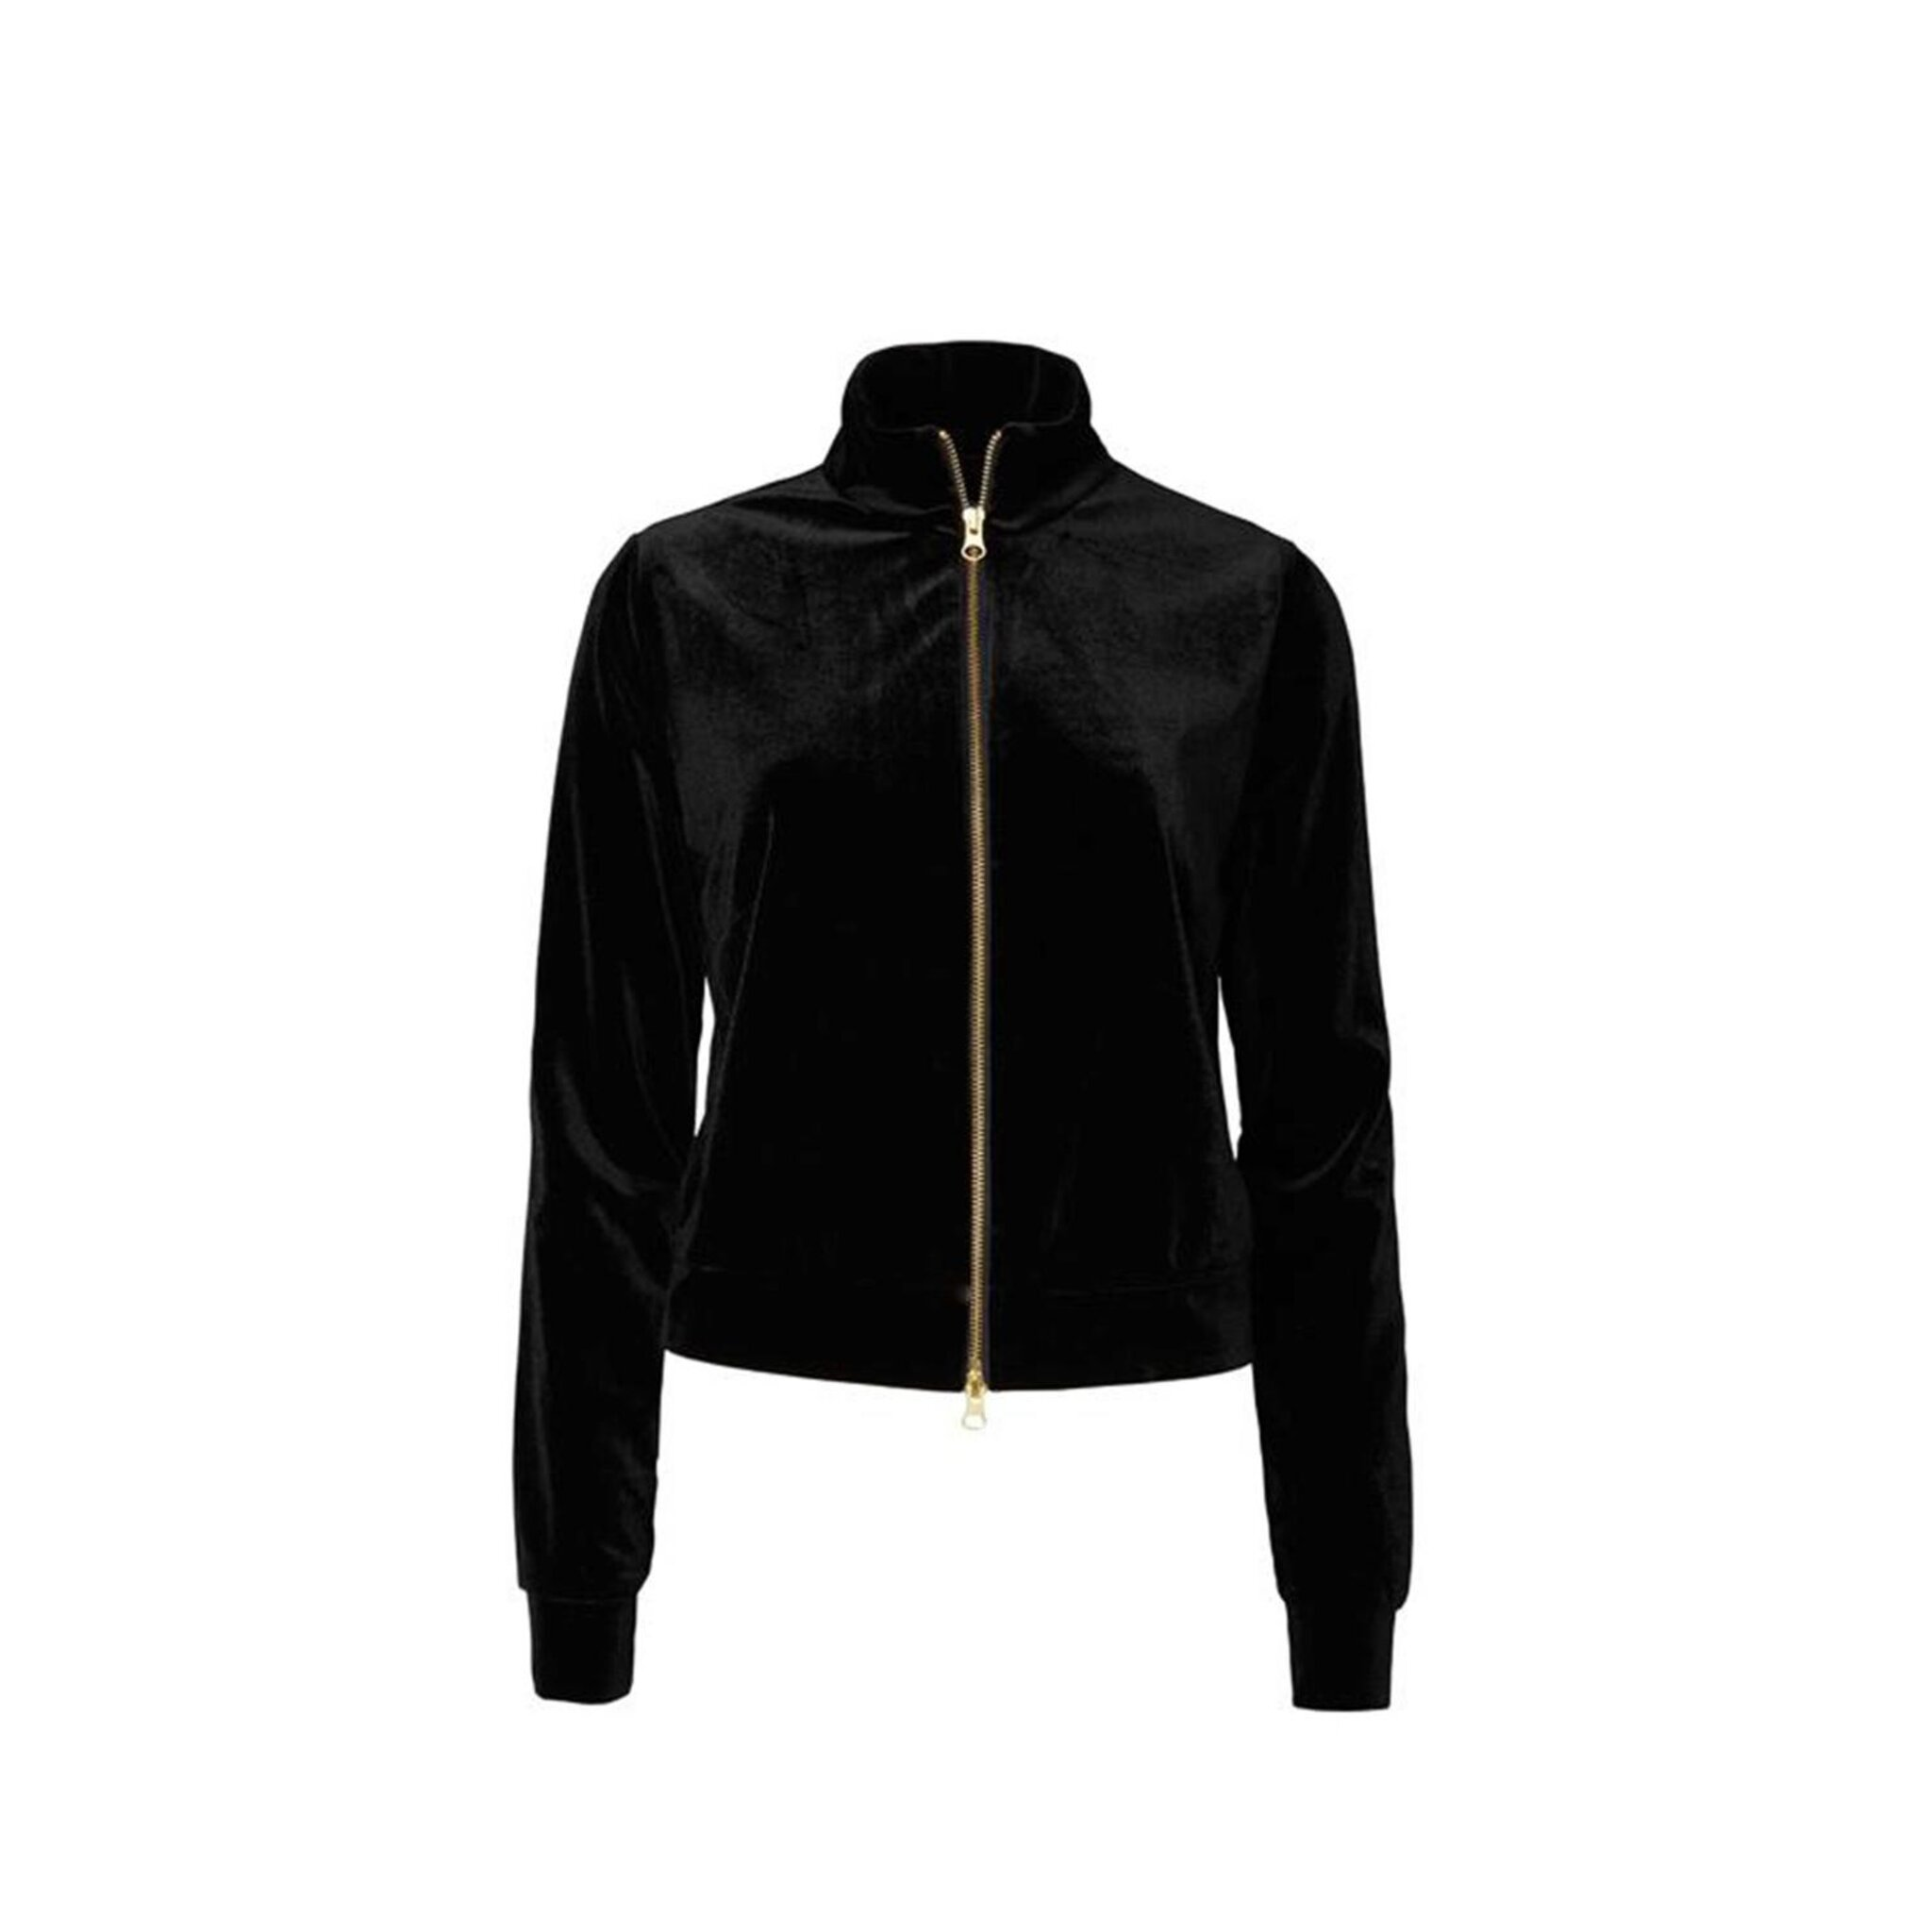 Annelie Bomber Jacket